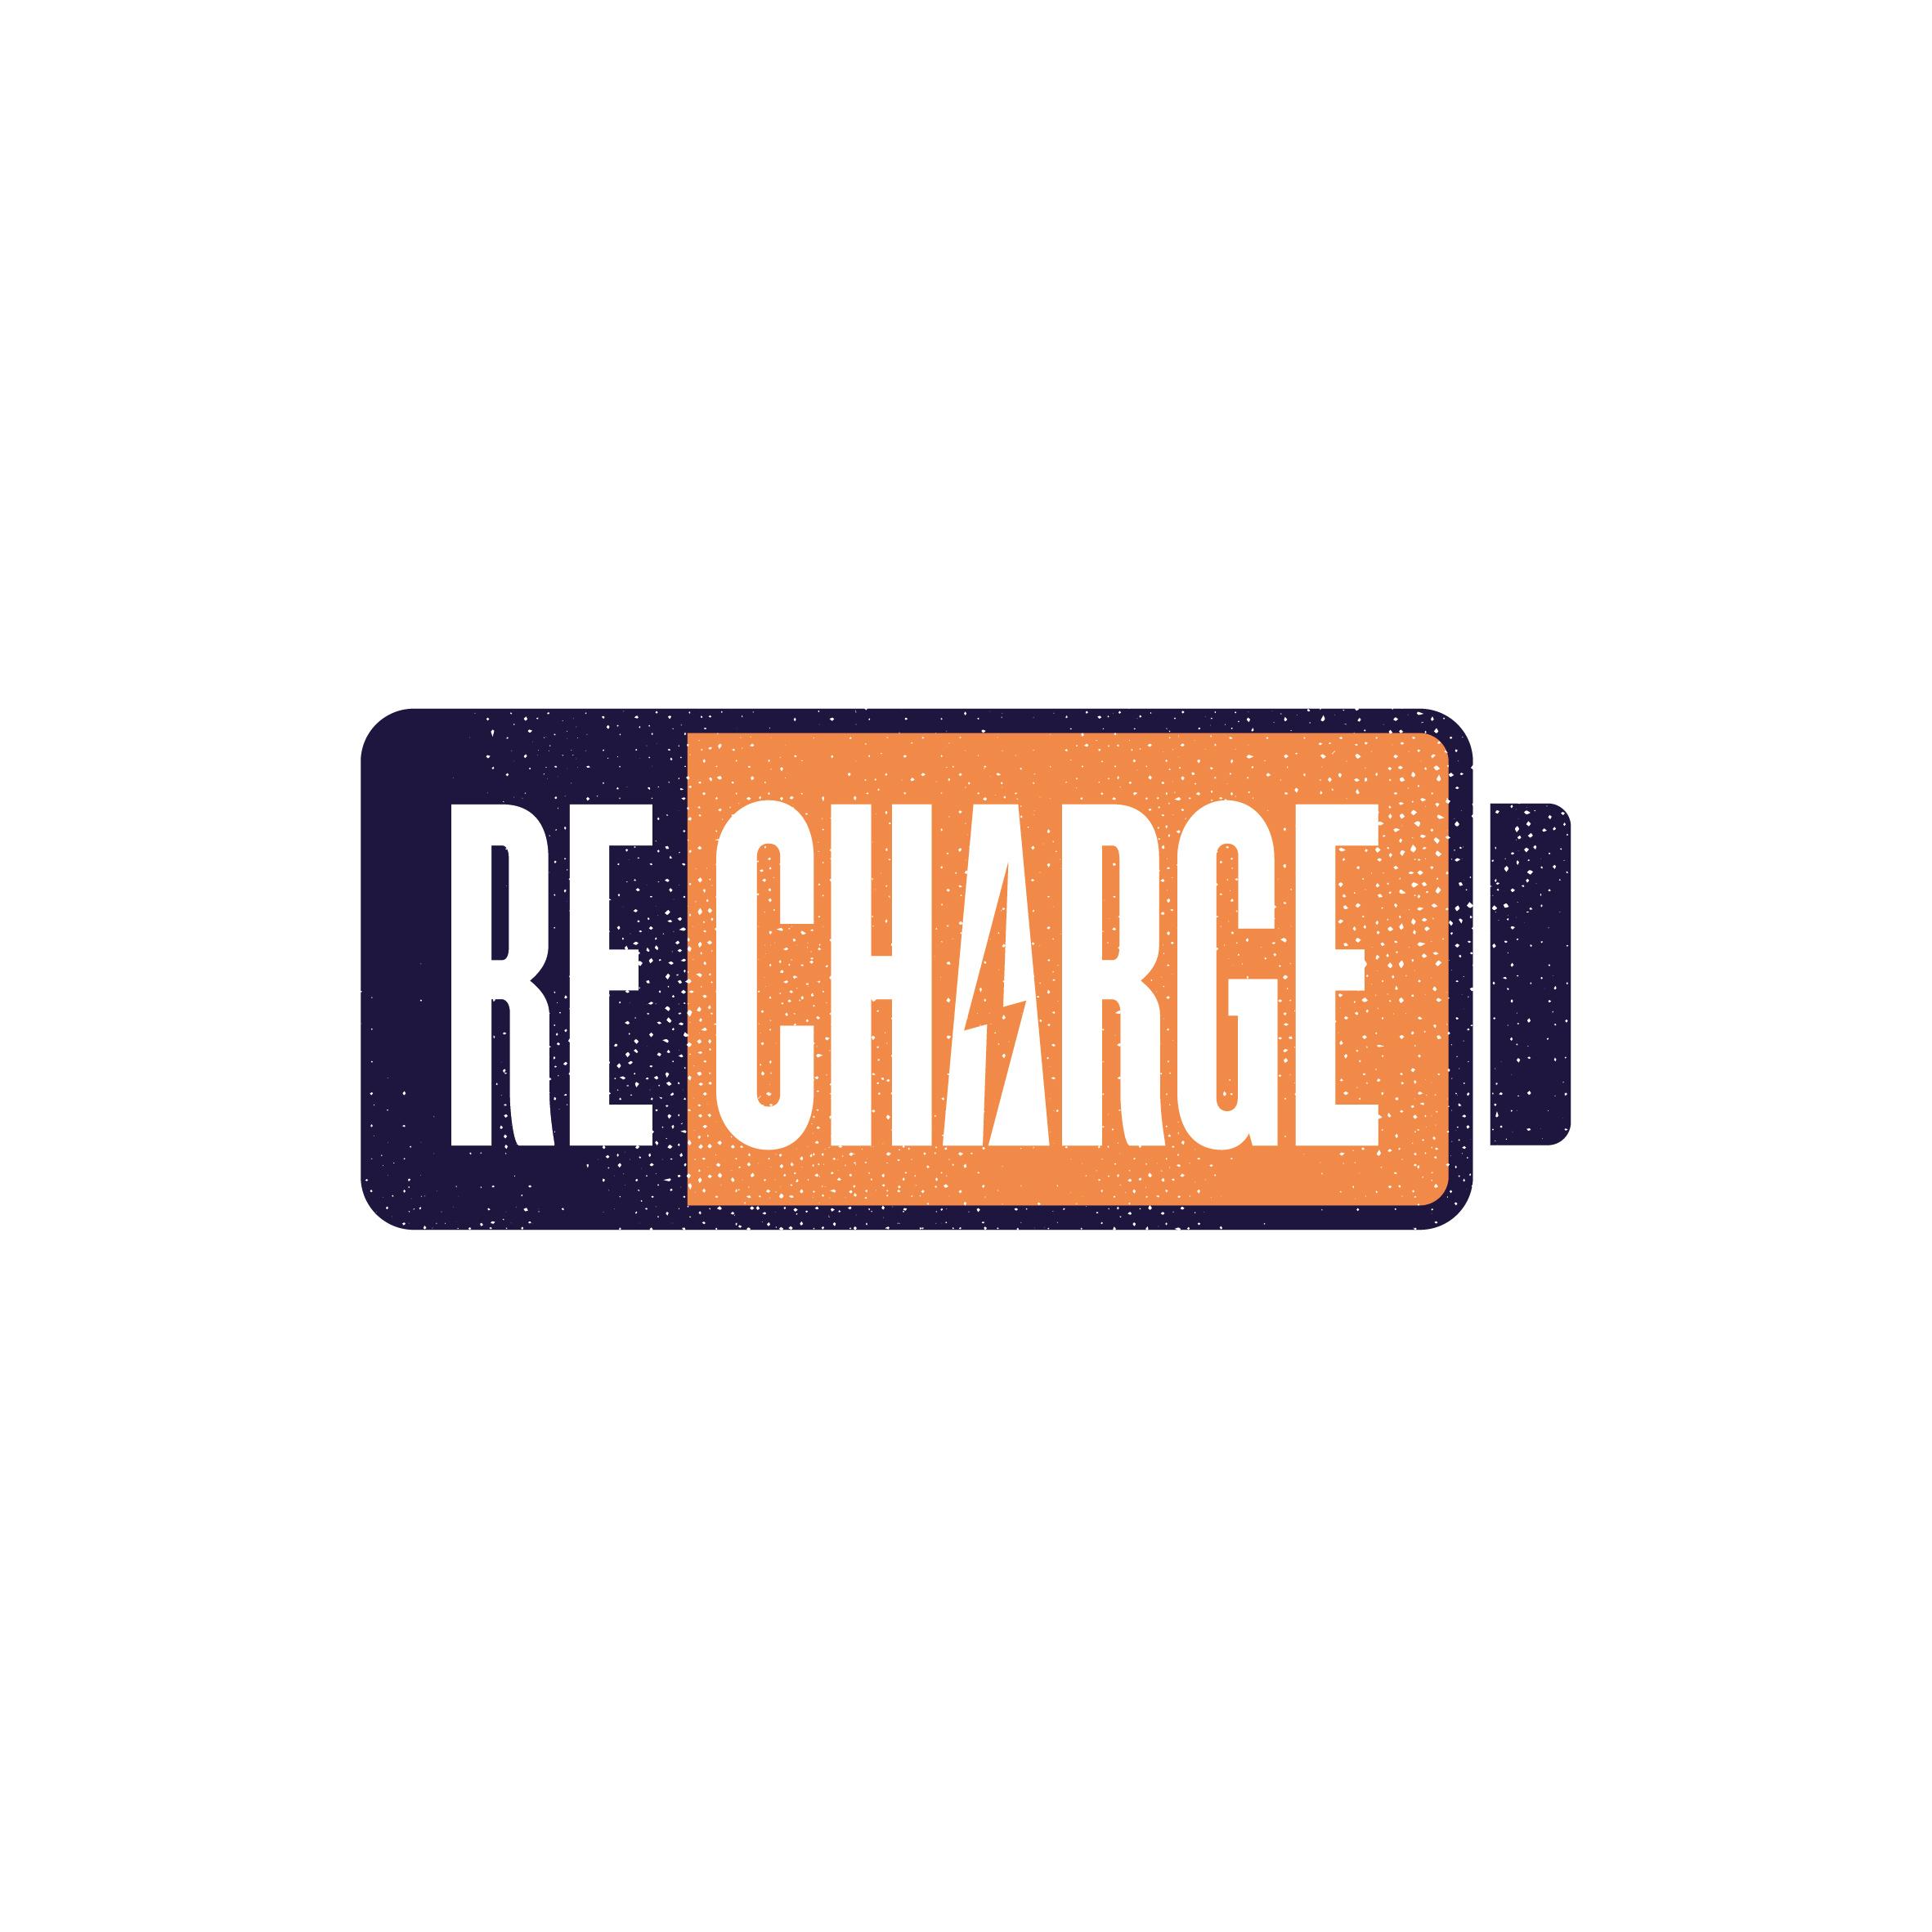 Recharge logo-01